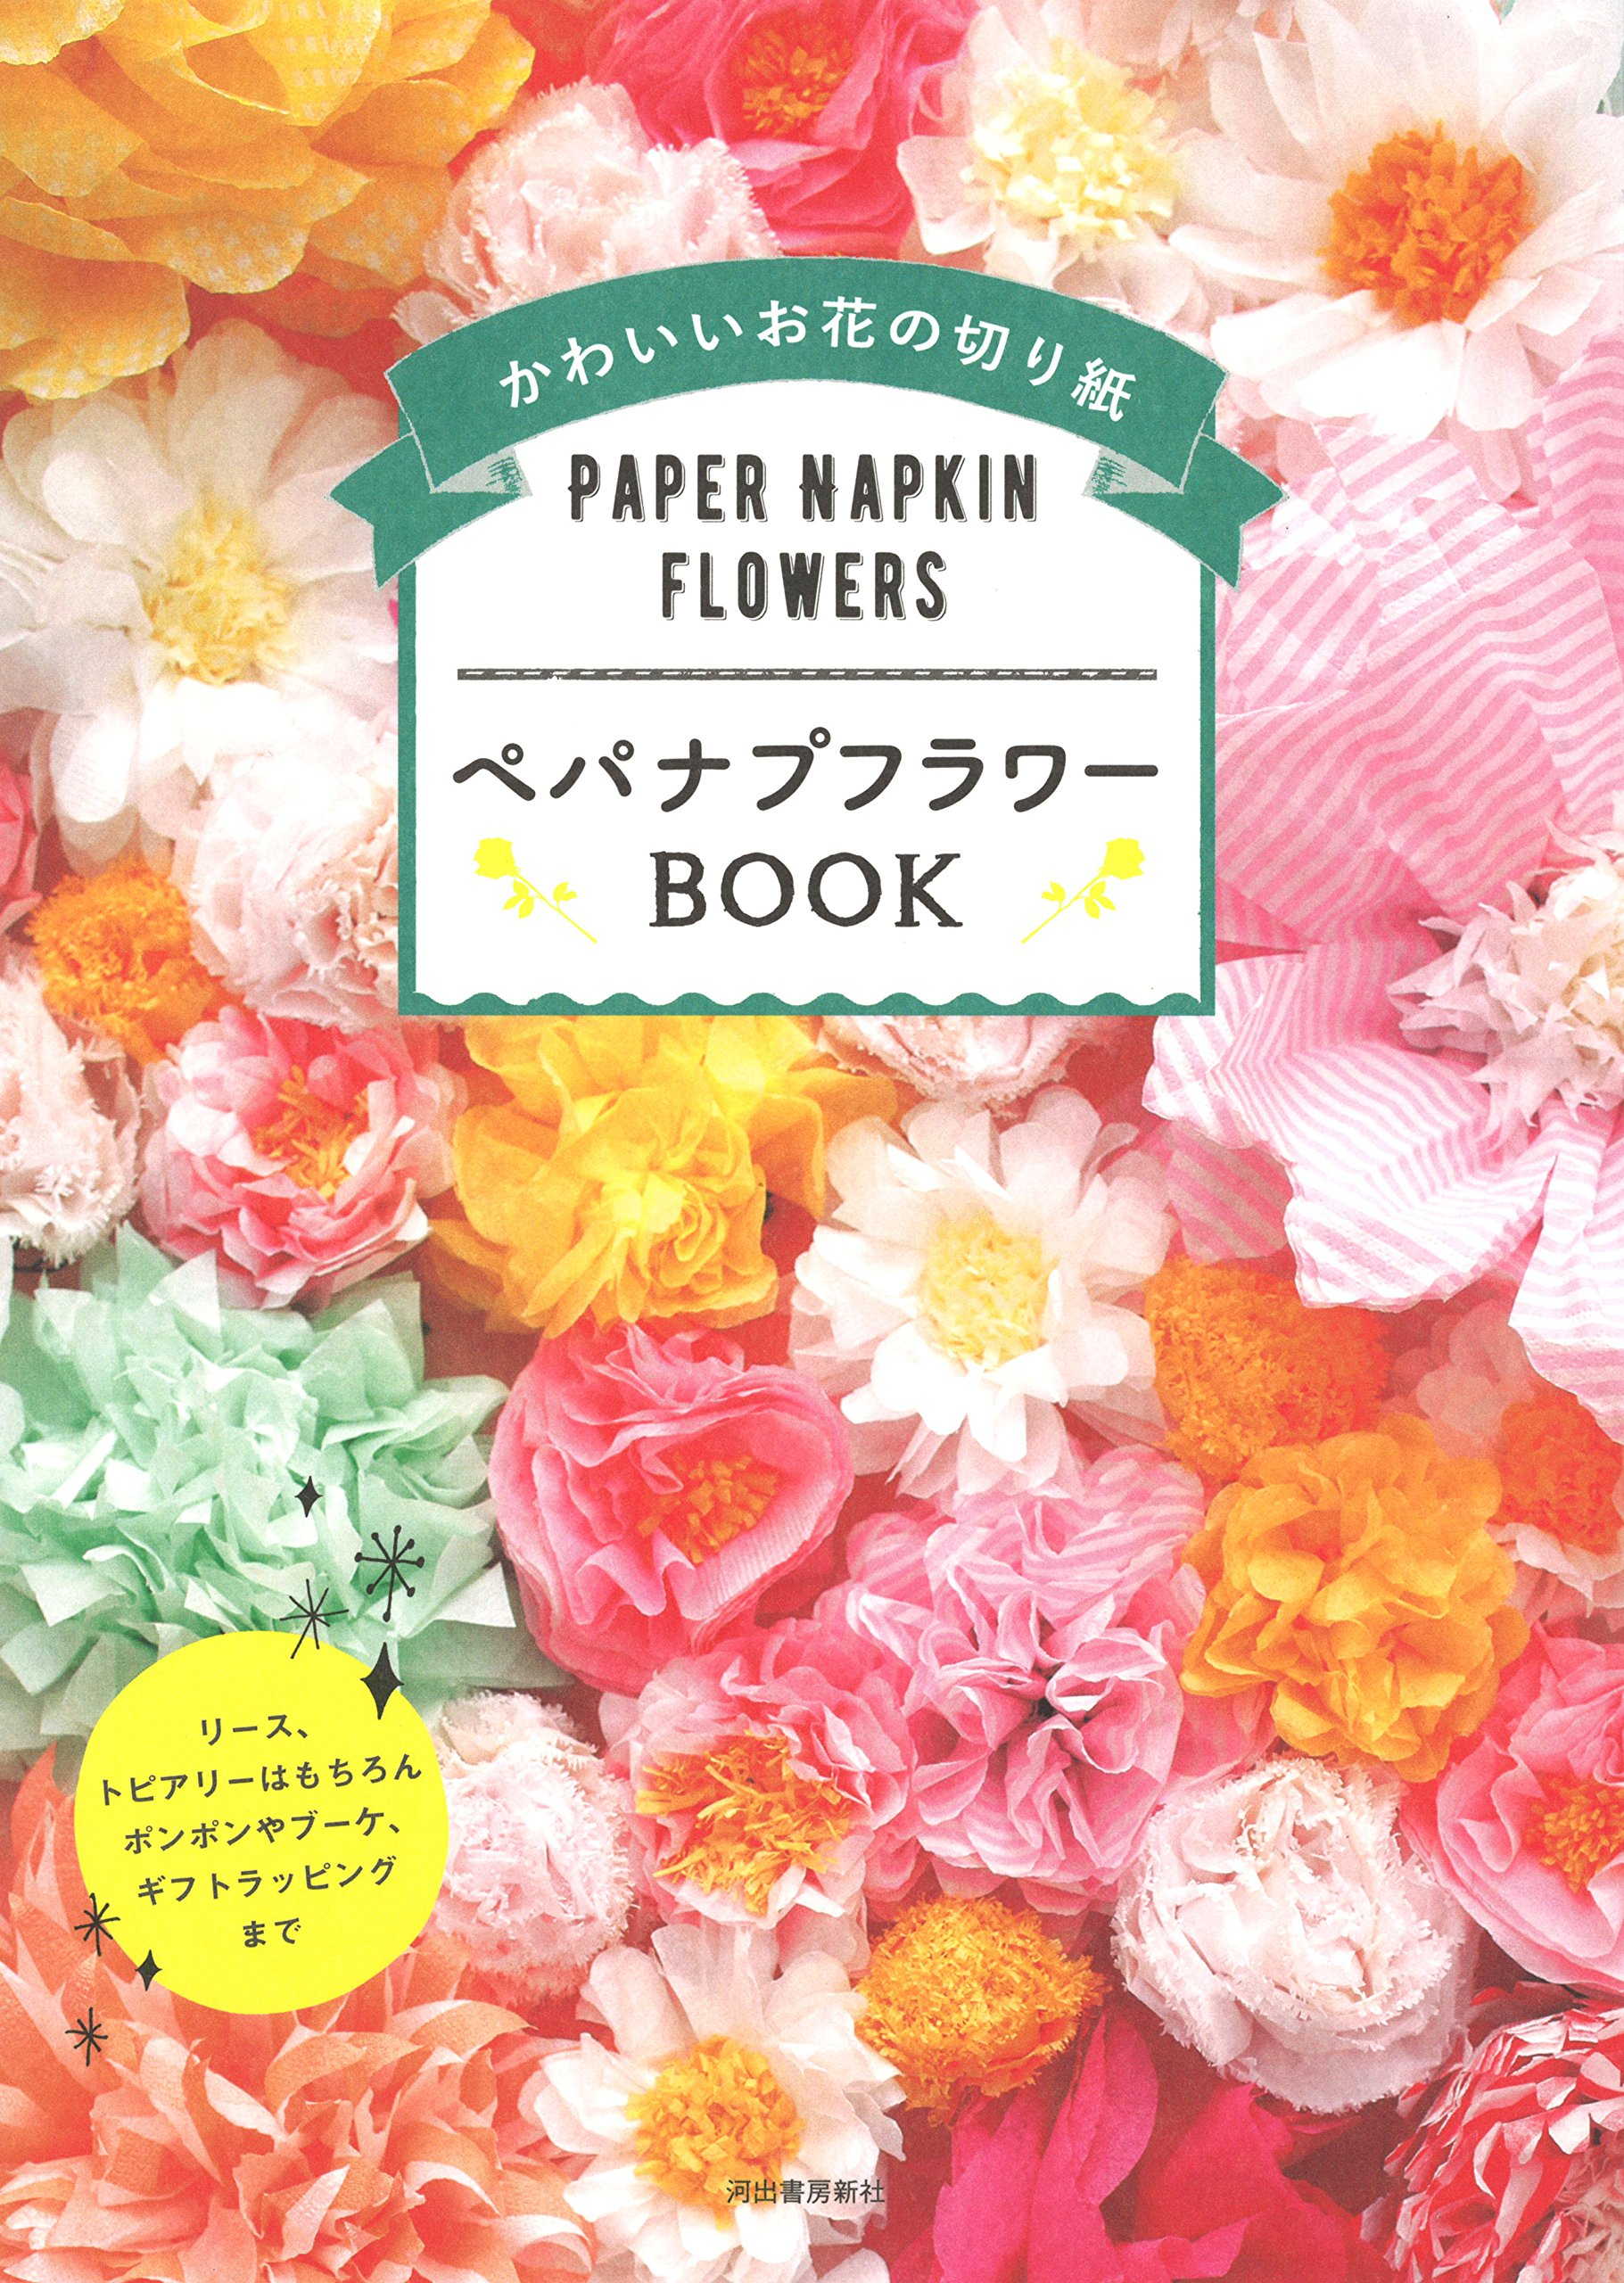 Pepanap Flower BOOK